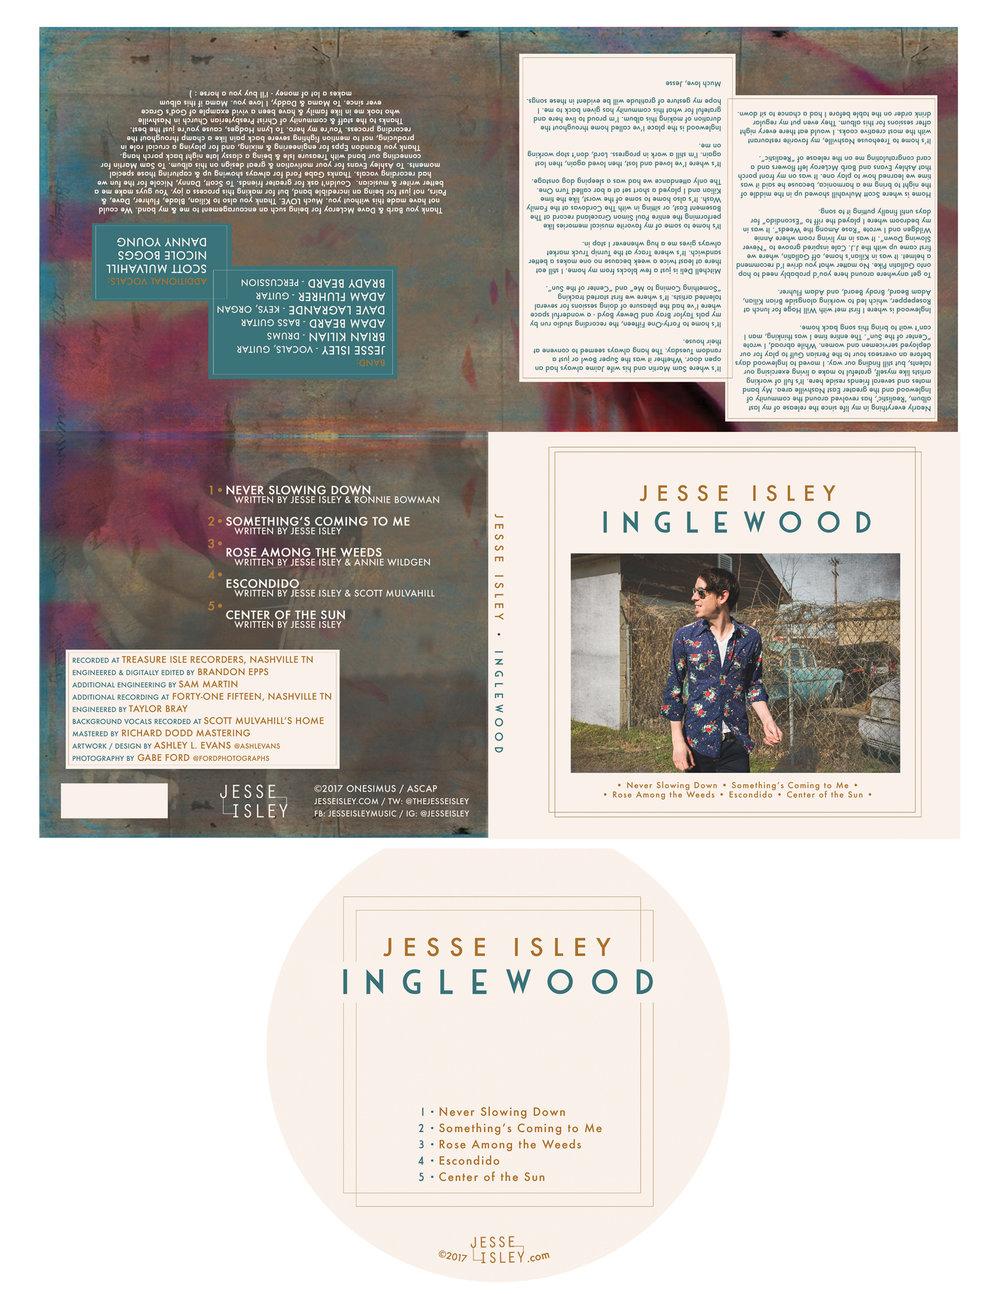 Jesse Isley CD Inglewood.jpg